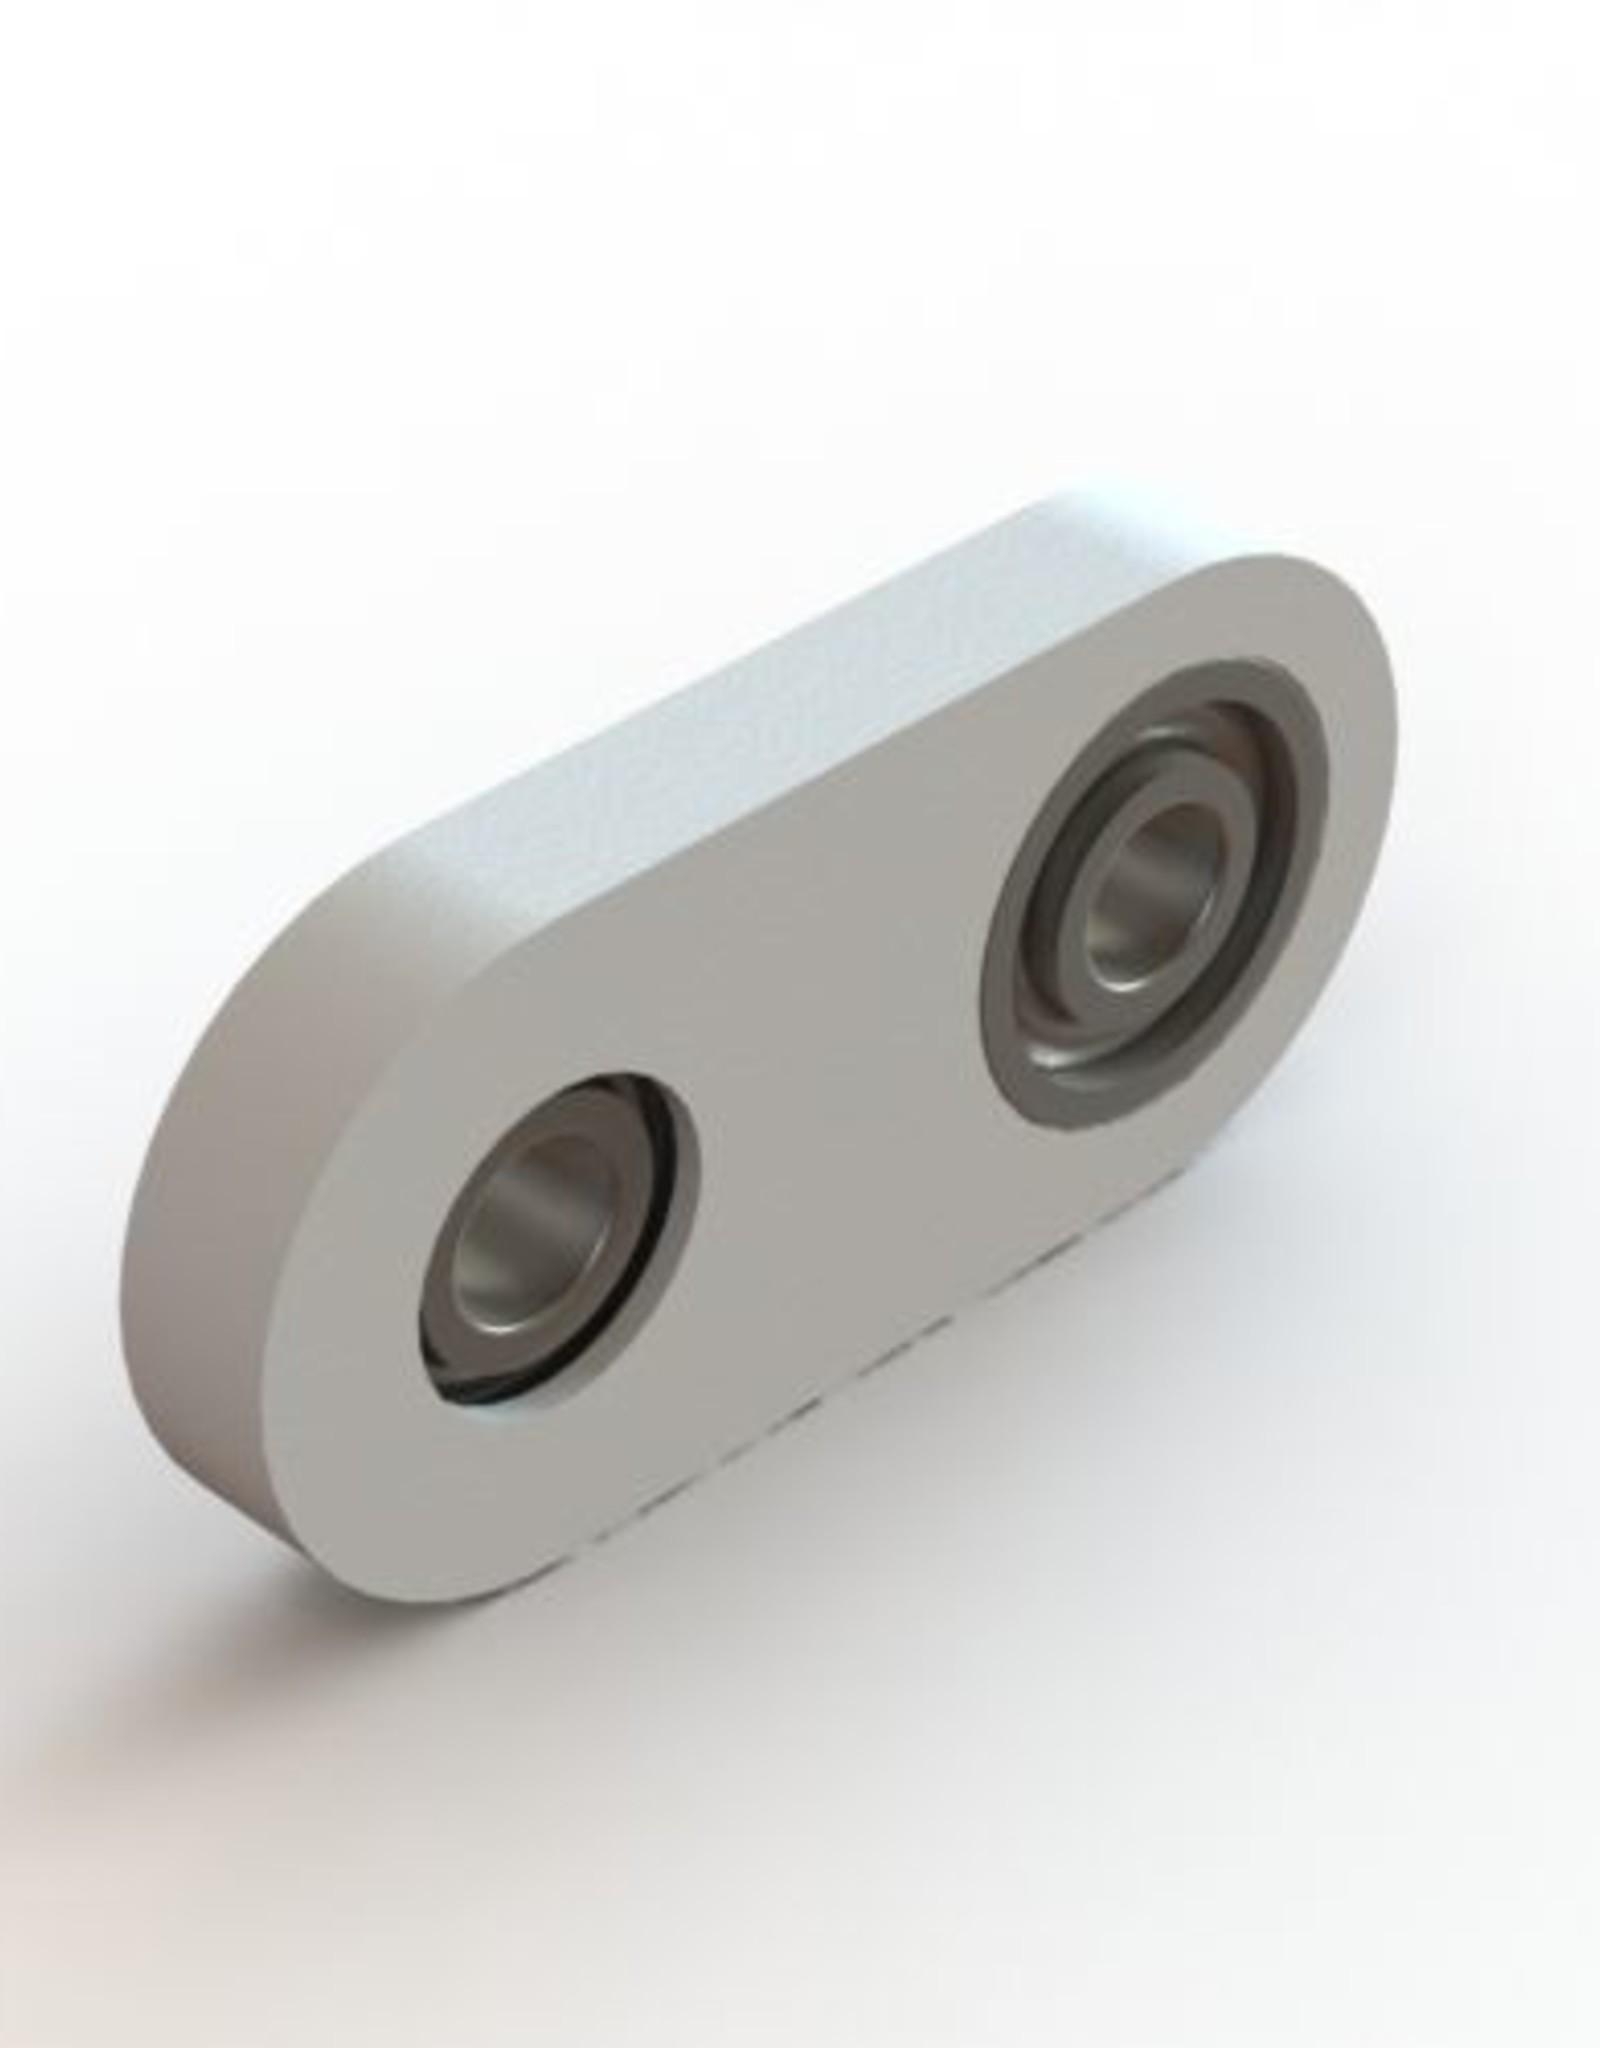 VLB Bread Slicers Small plastic crankshaft, including bearings